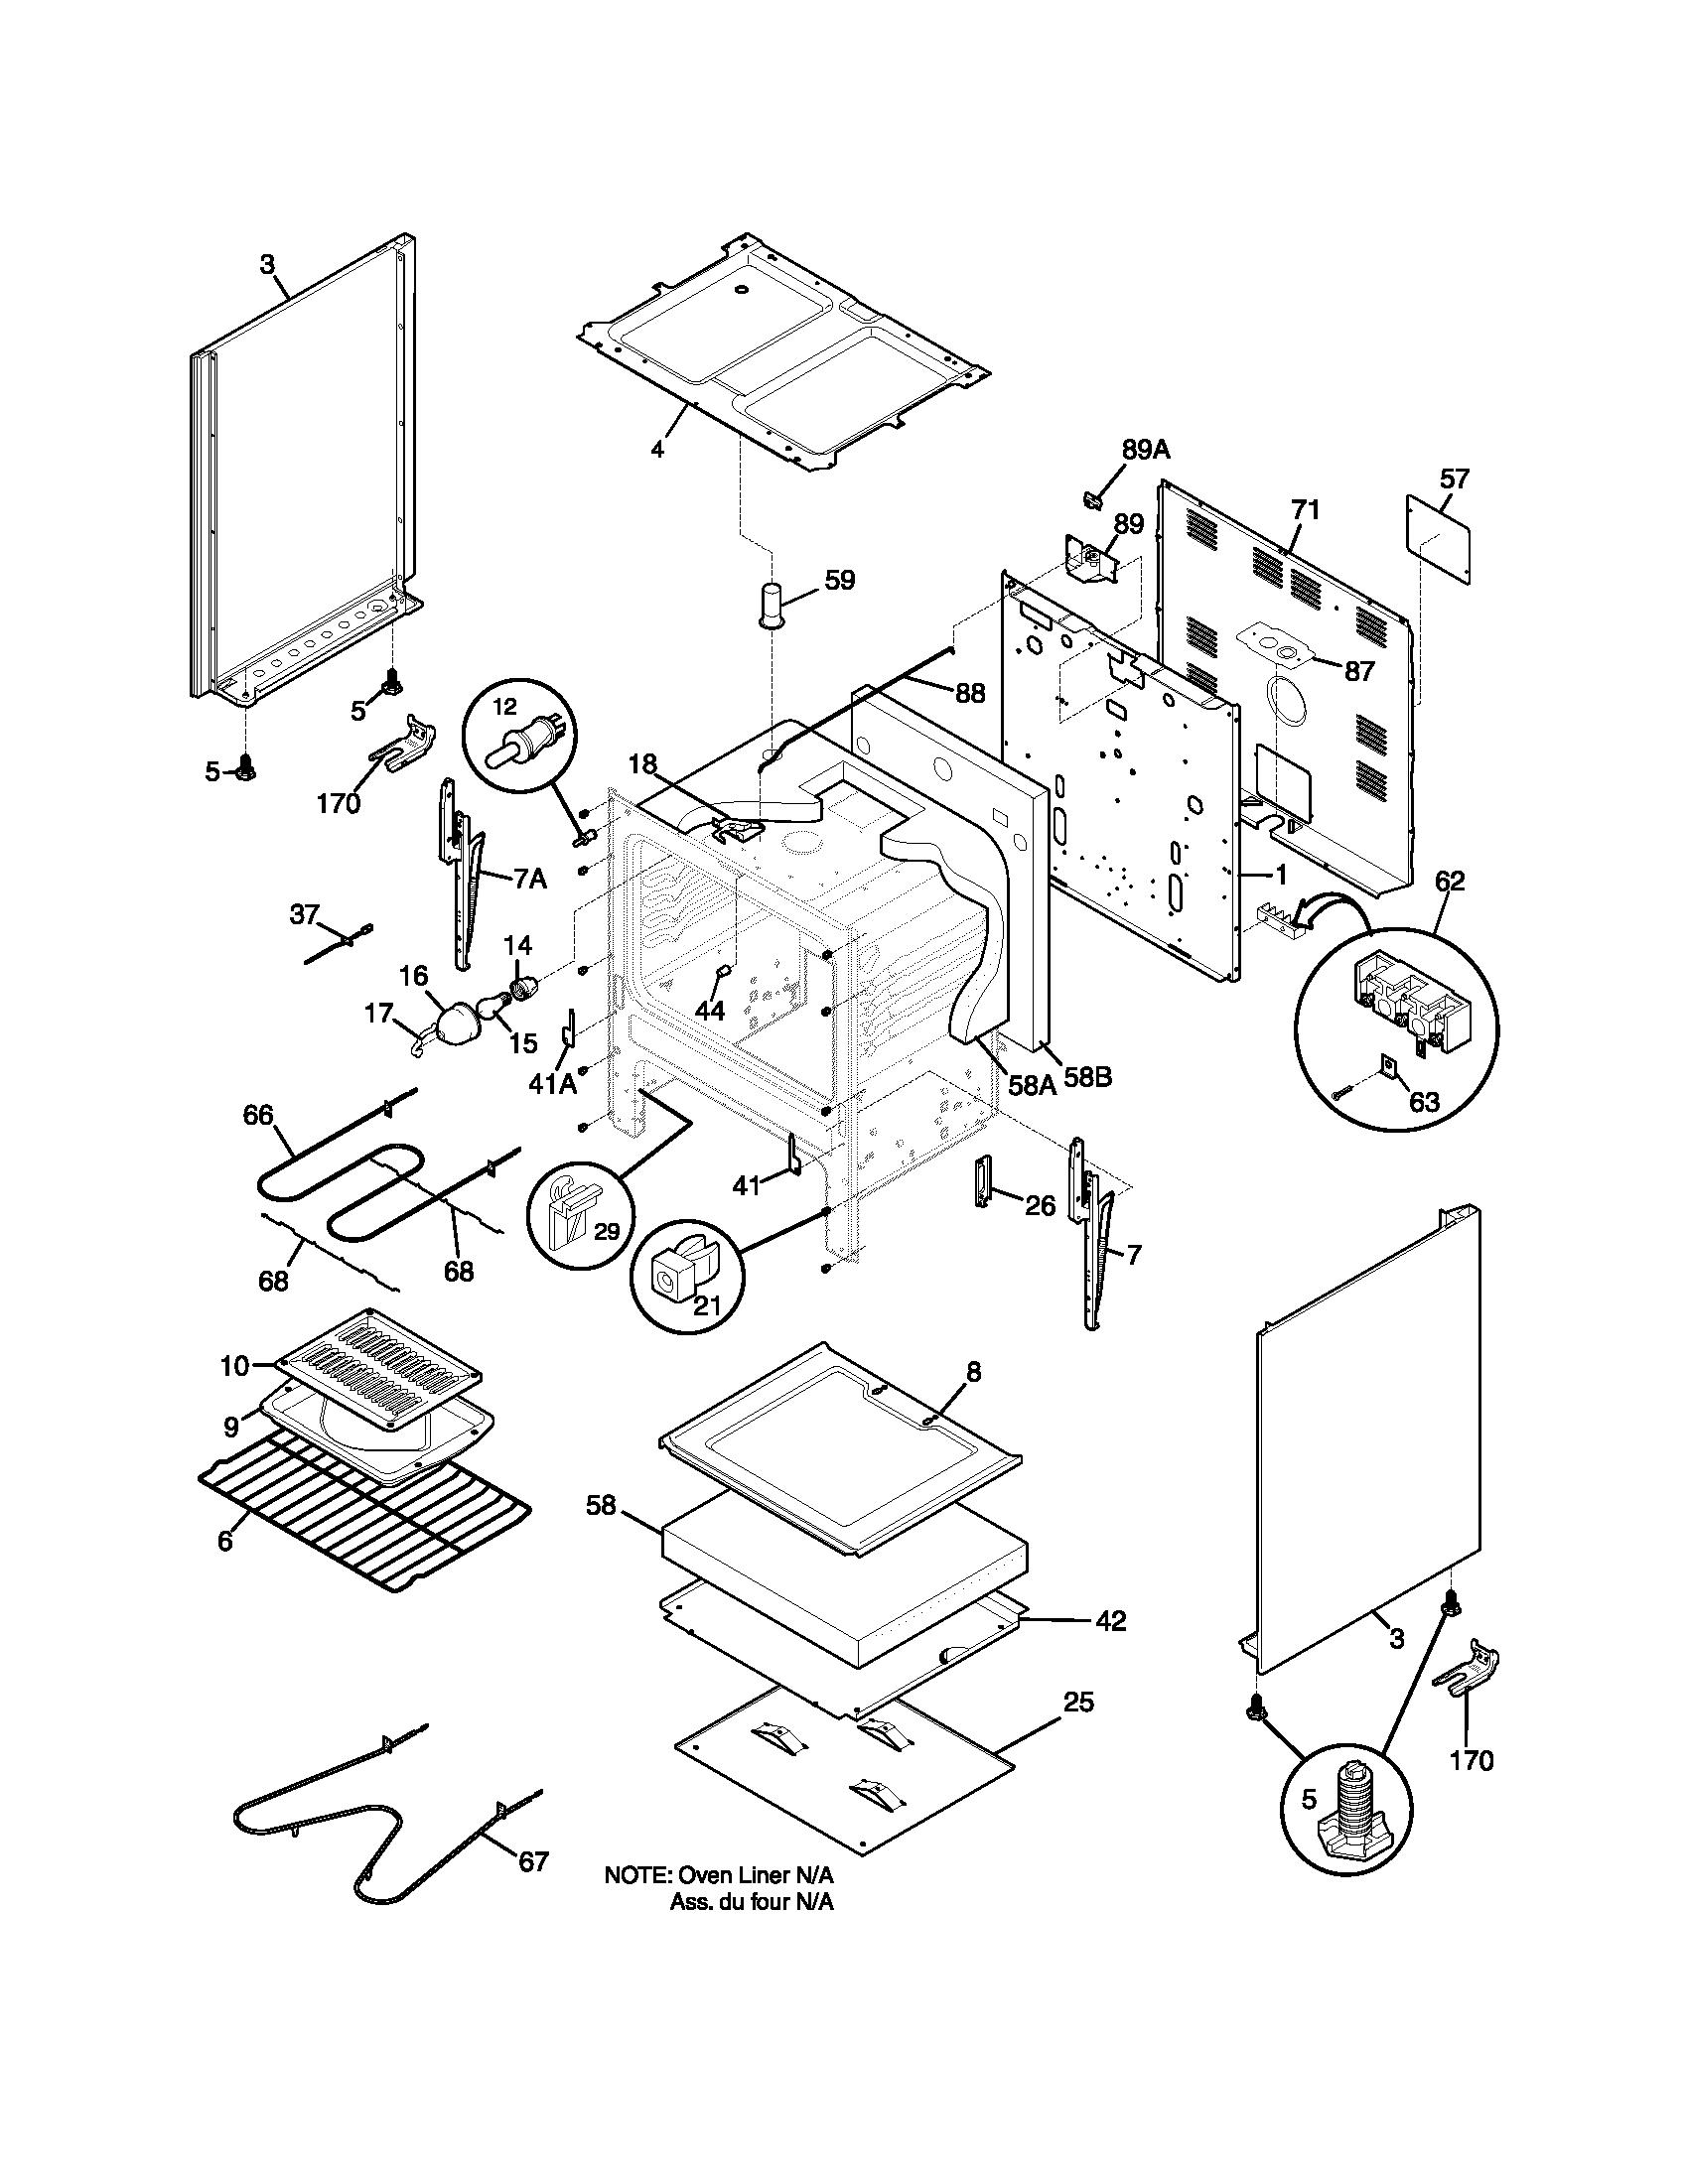 Awesome honda ct110 wiring diagram contemporary electrical and interesting nash kelvinator refrigerator wiring diagram swarovskicordoba Gallery